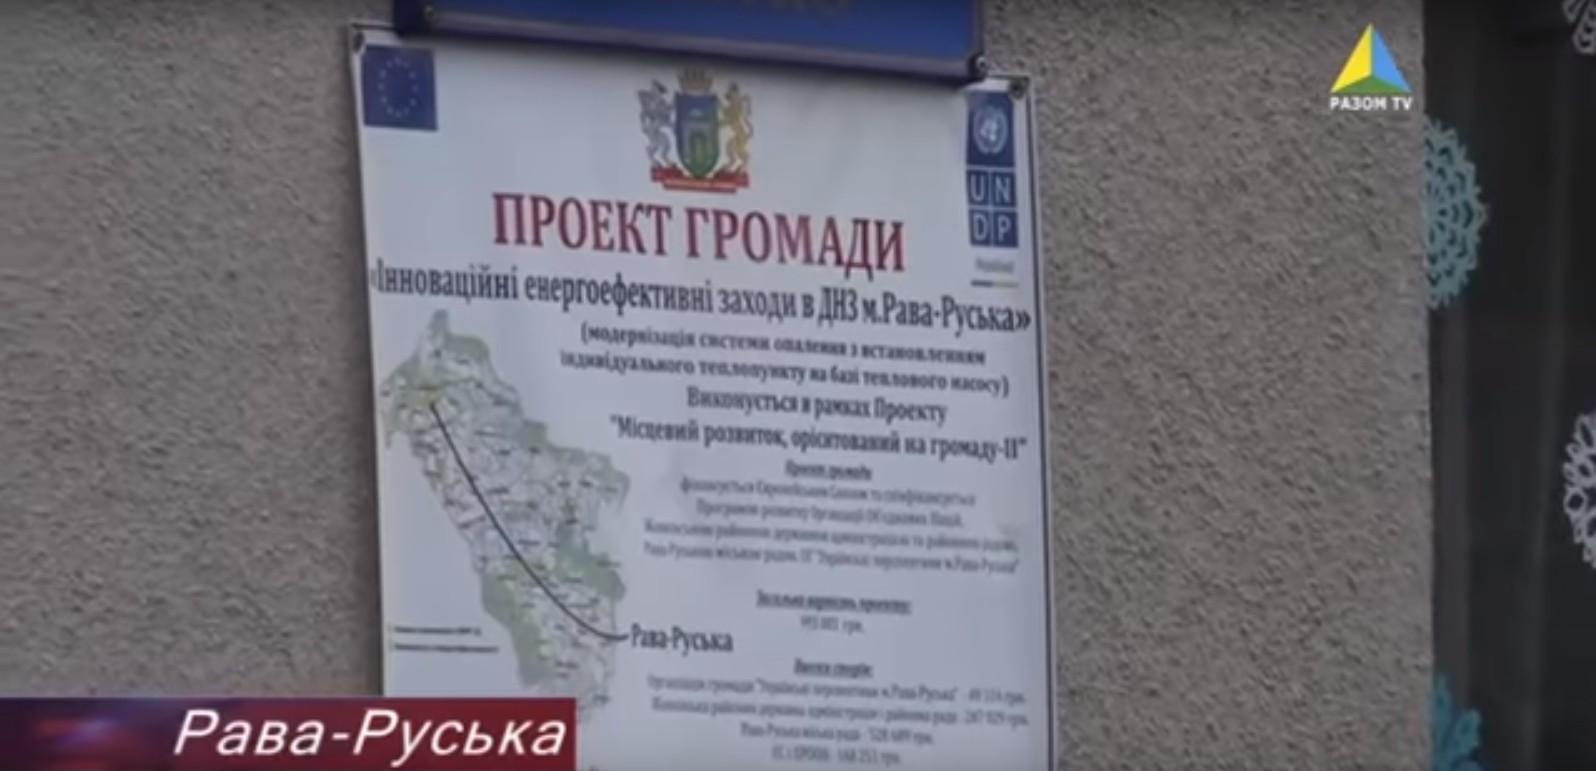 Тепловий насос Nibe в Рава Руська